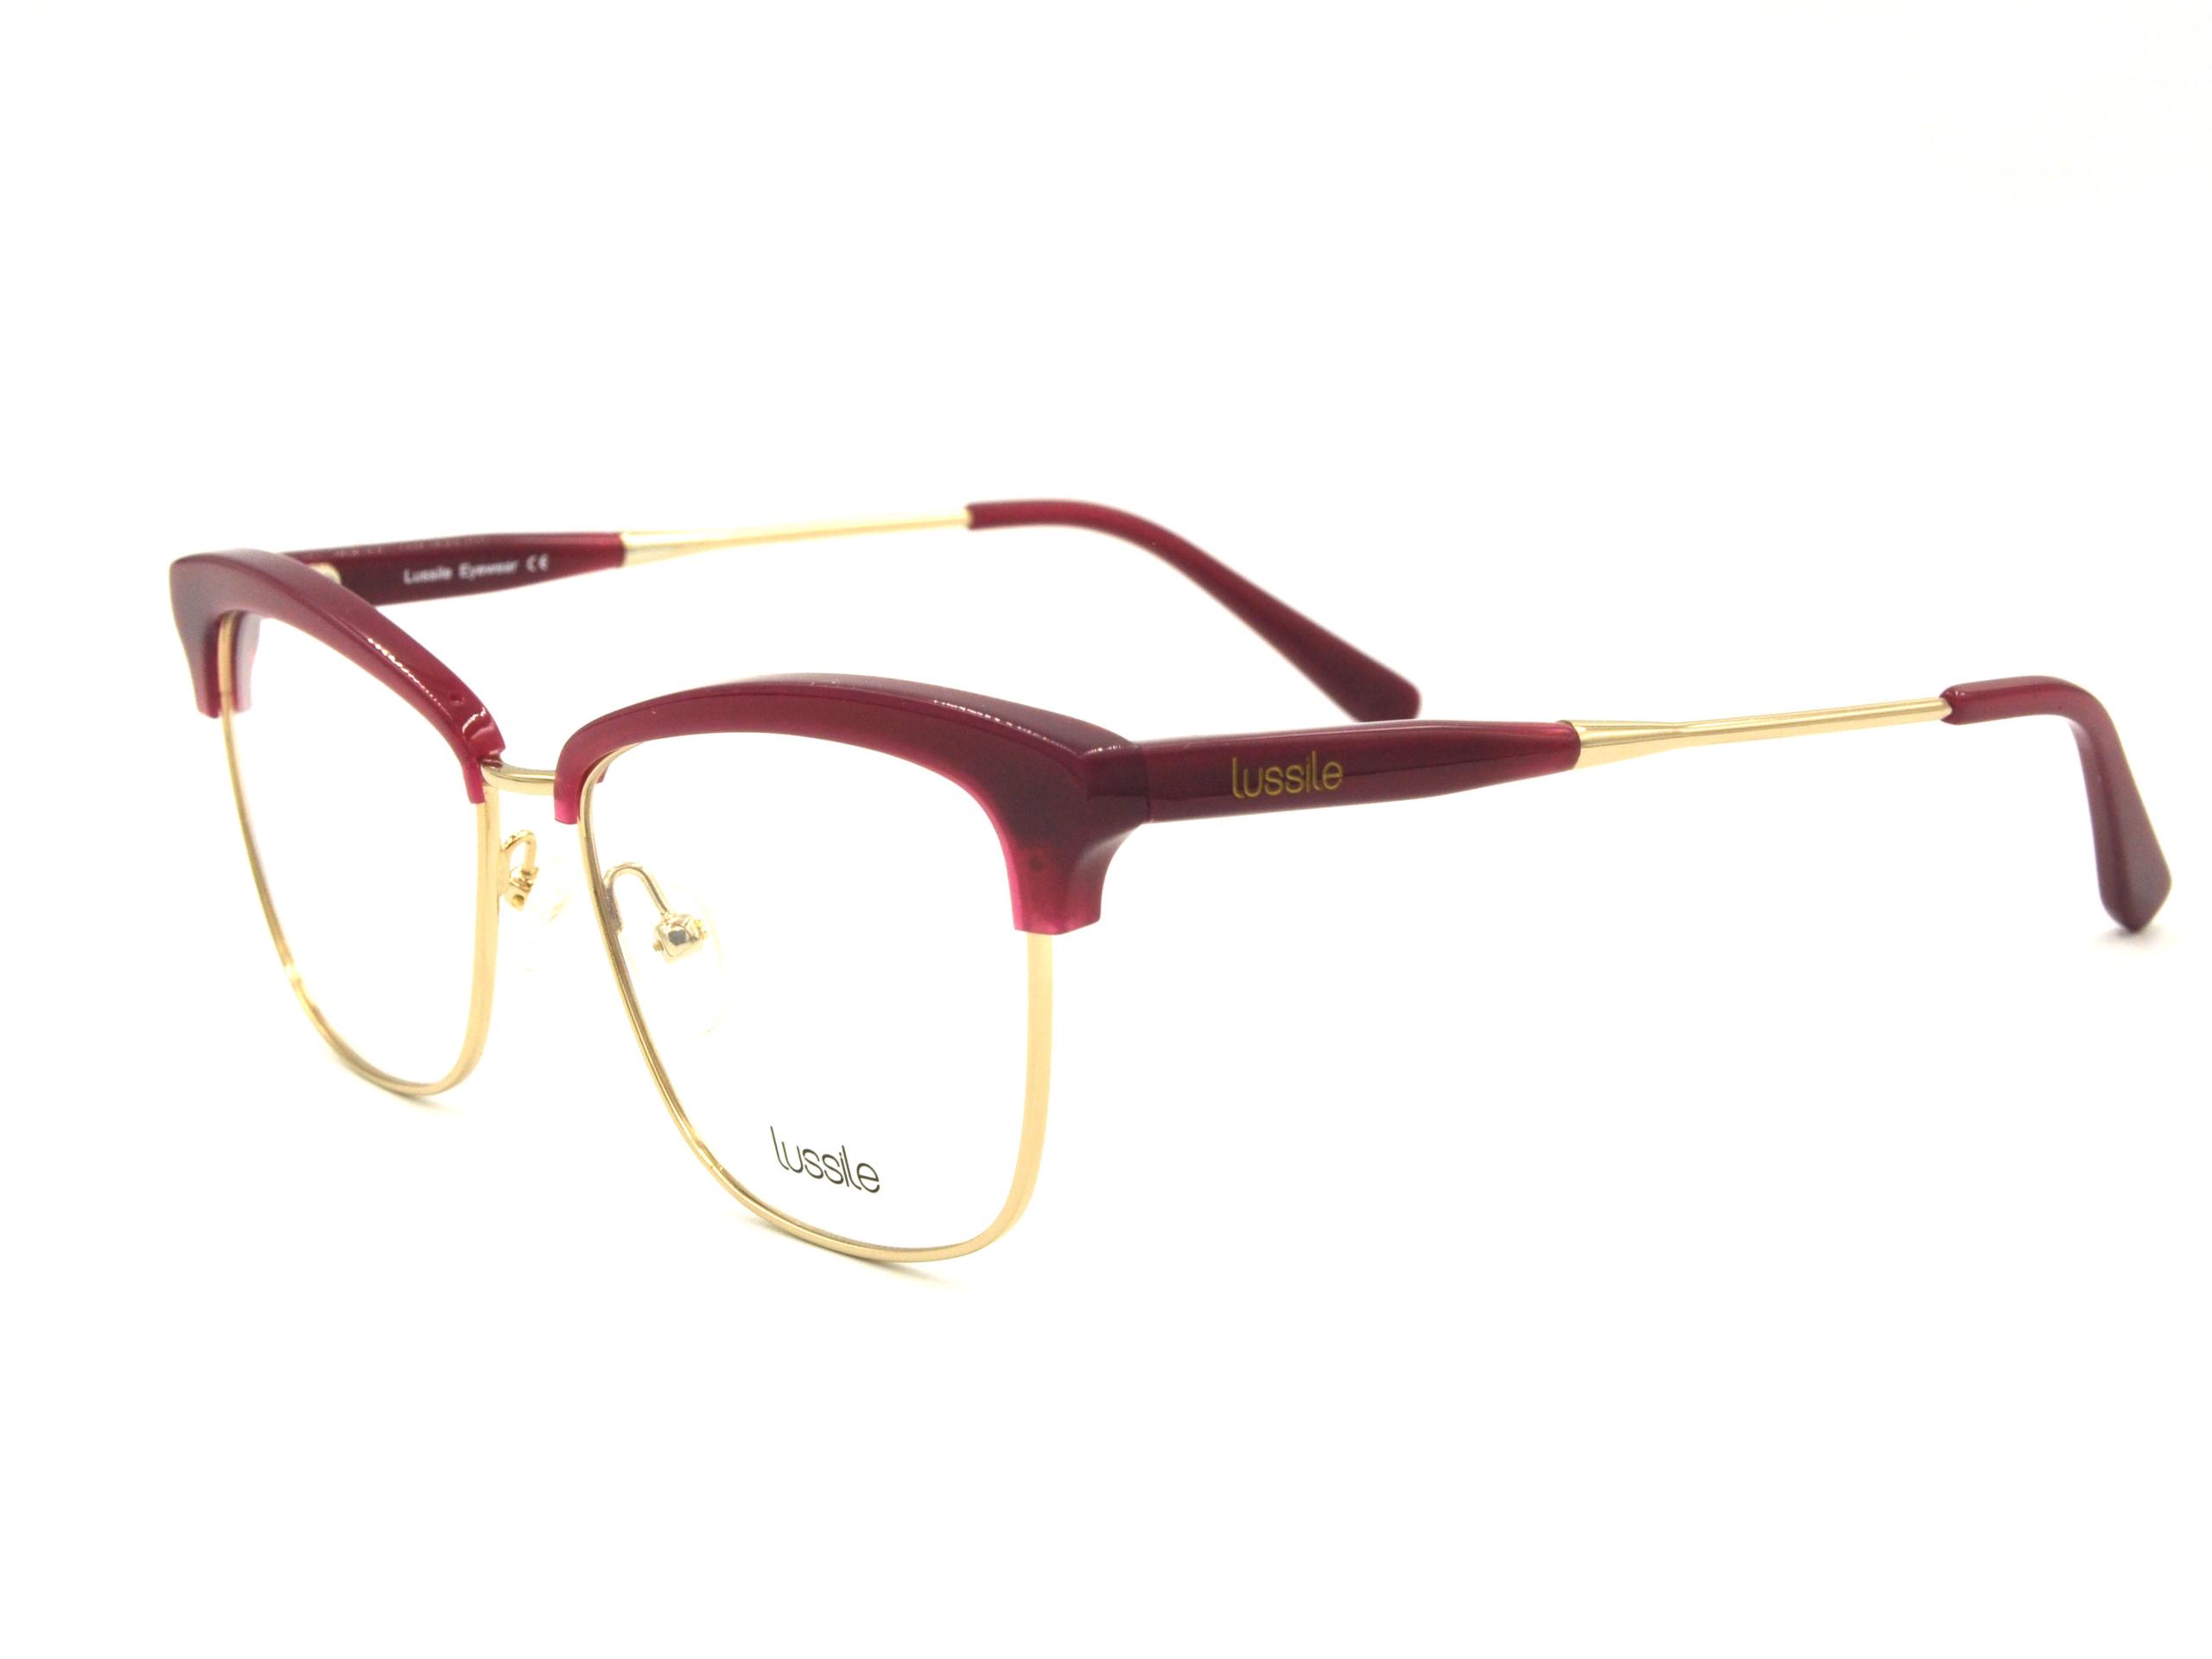 Lussile ls32208 LN03 Prescription Glasses 2020